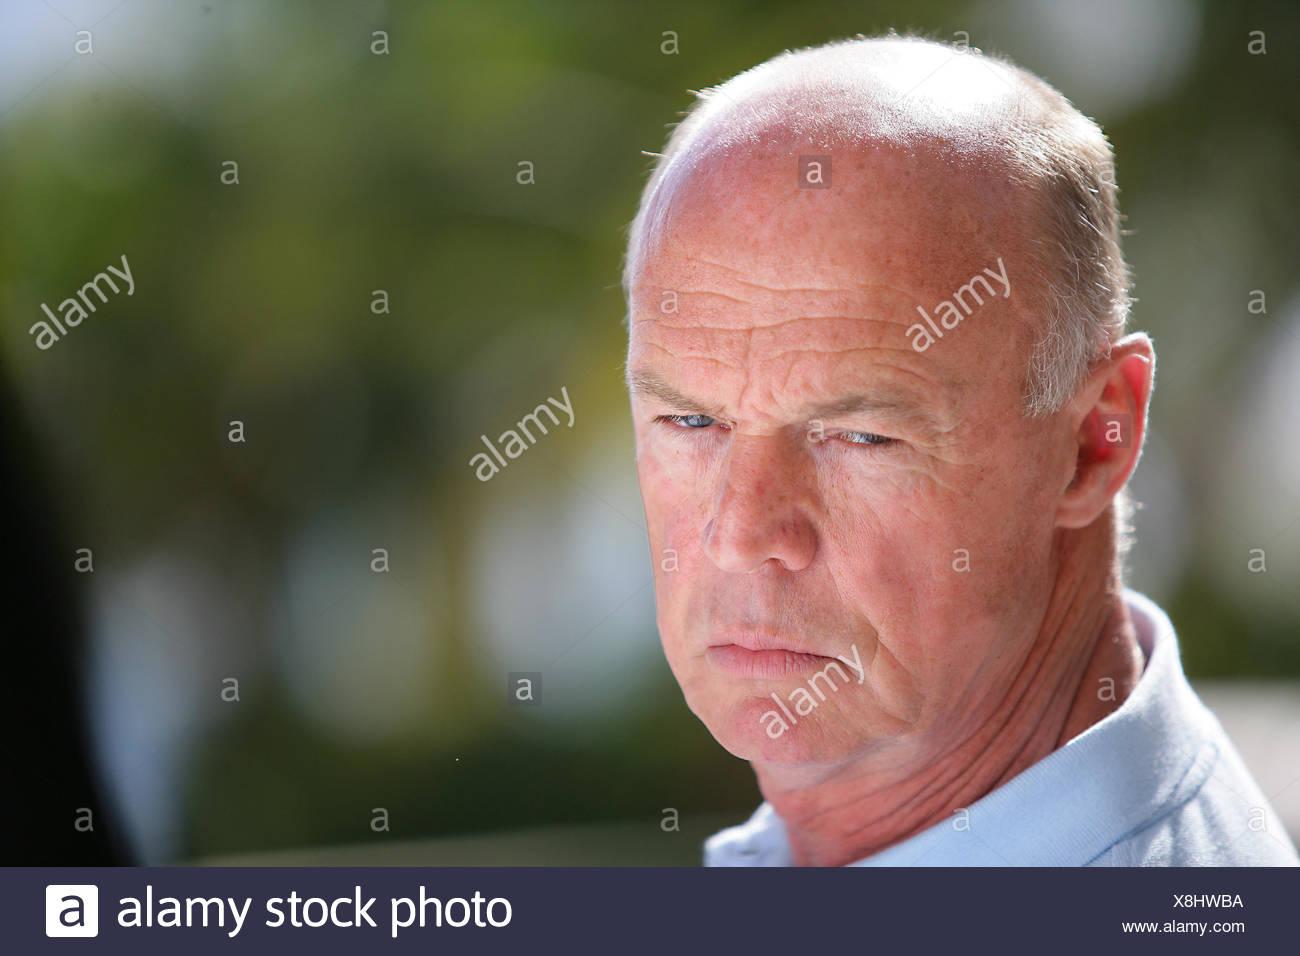 A grumpy old man Stock Photo